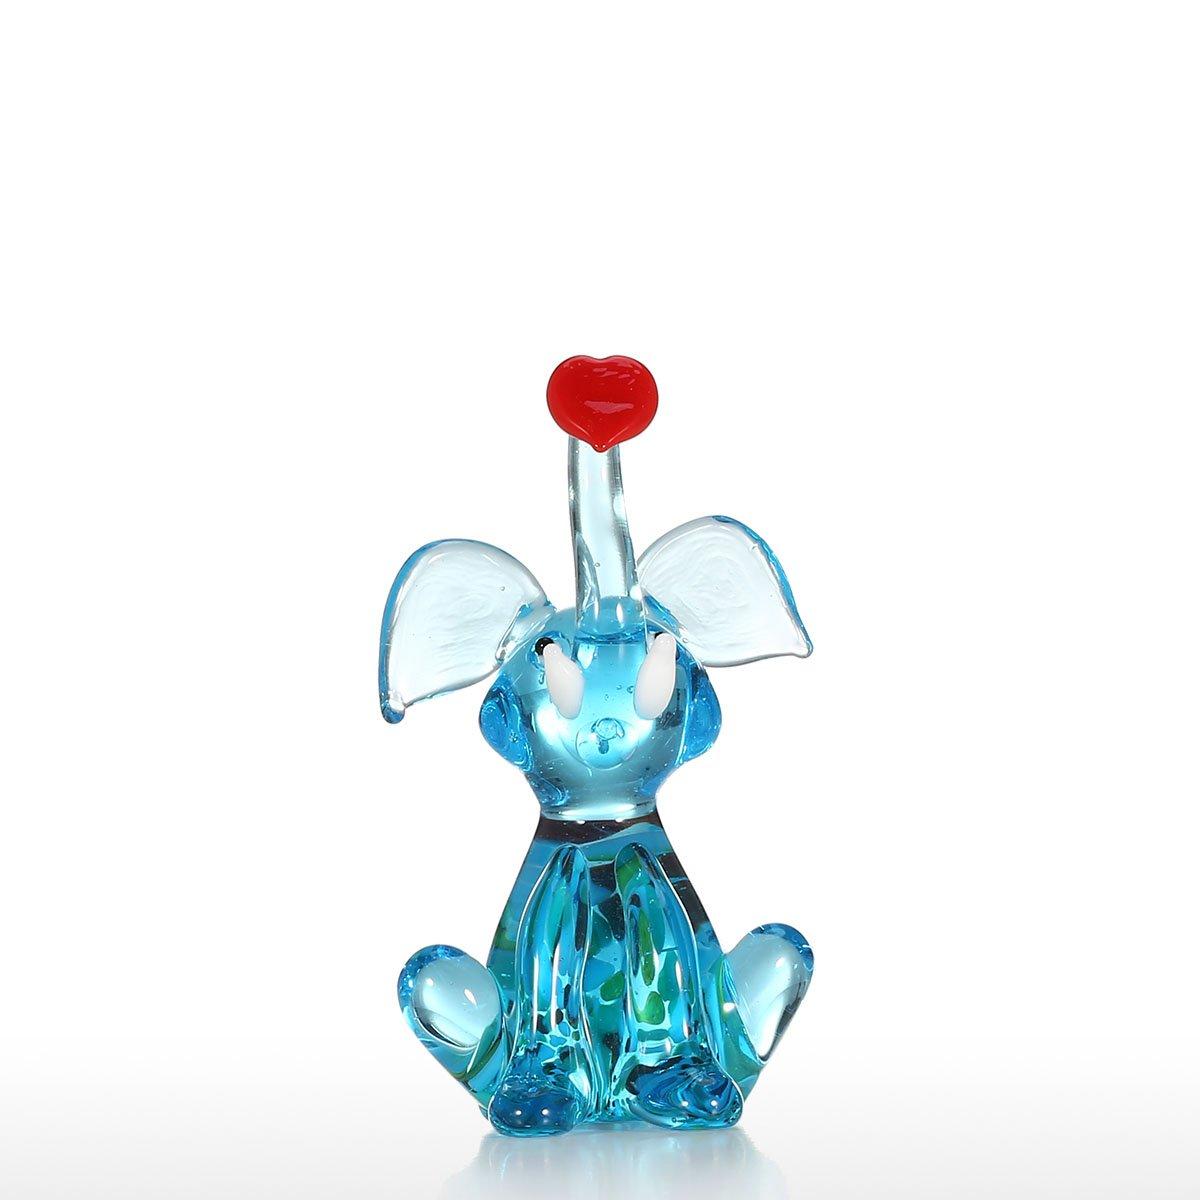 Tooarts Mini Elephant Handmade Sculpture Hand Blown Glass Art Wild Animal Figurine Collectible